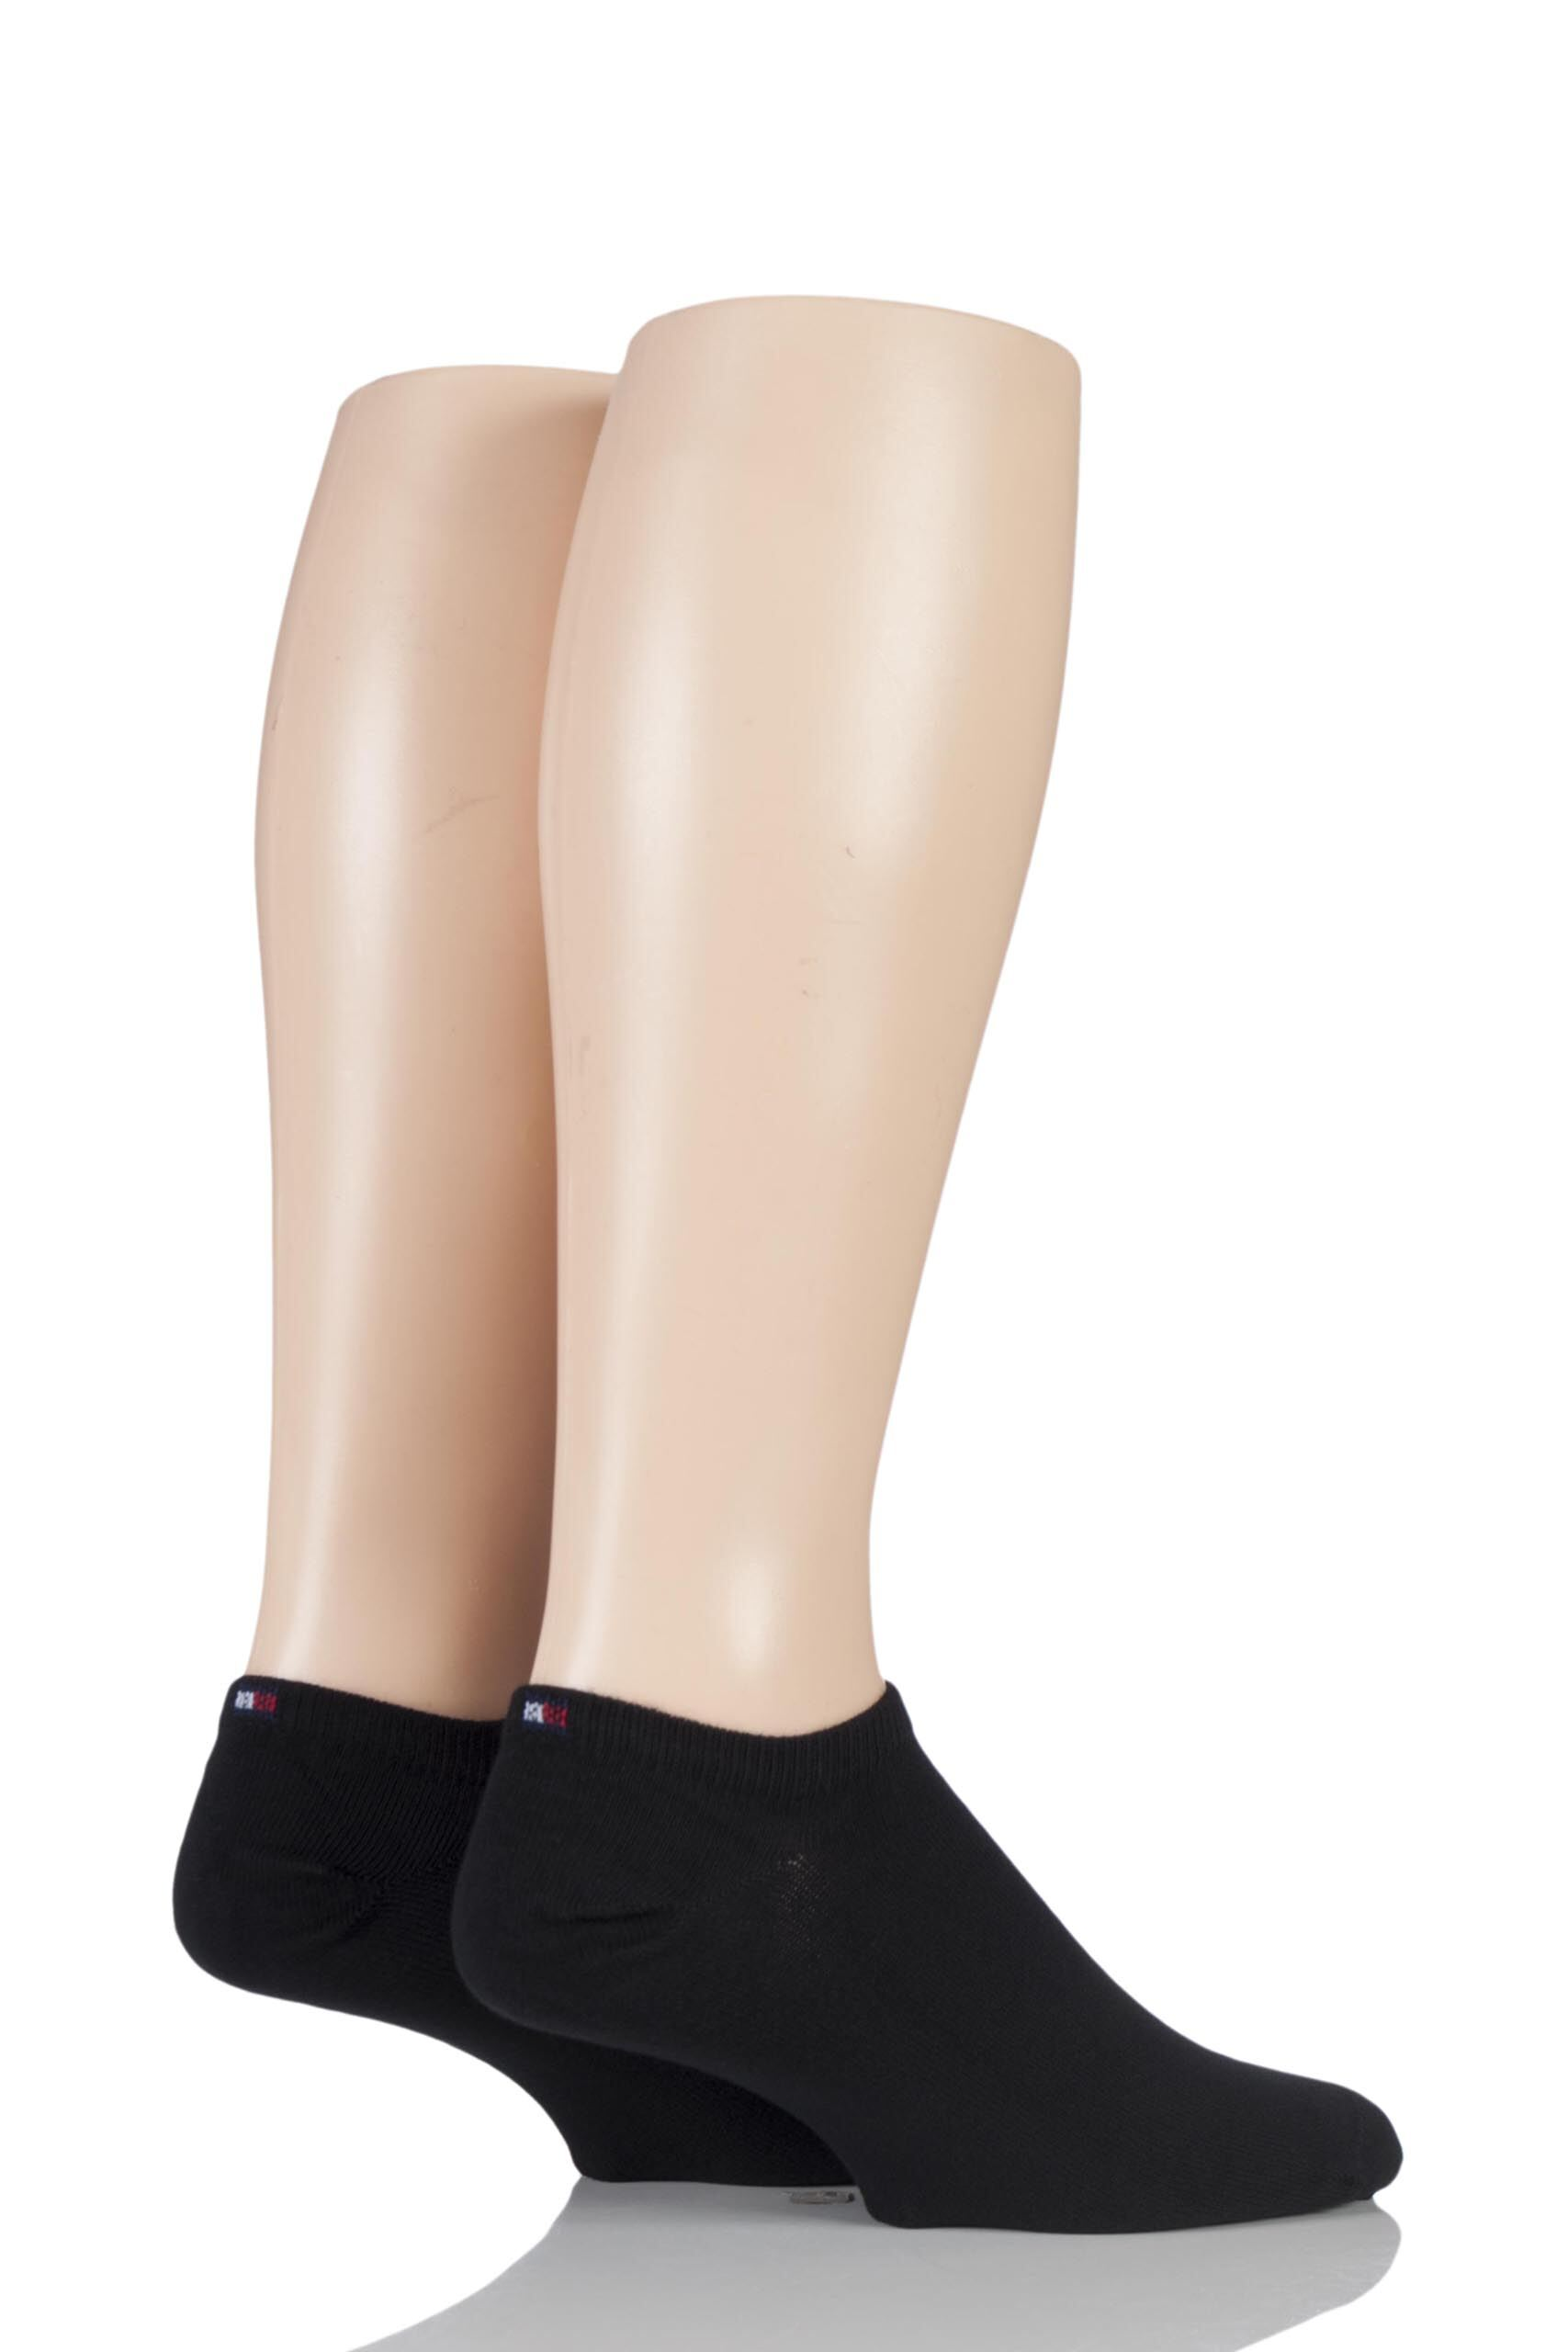 2 Pair Black Plain Cotton Sneaker Socks Men's 12-14 Mens - Tommy Hilfiger